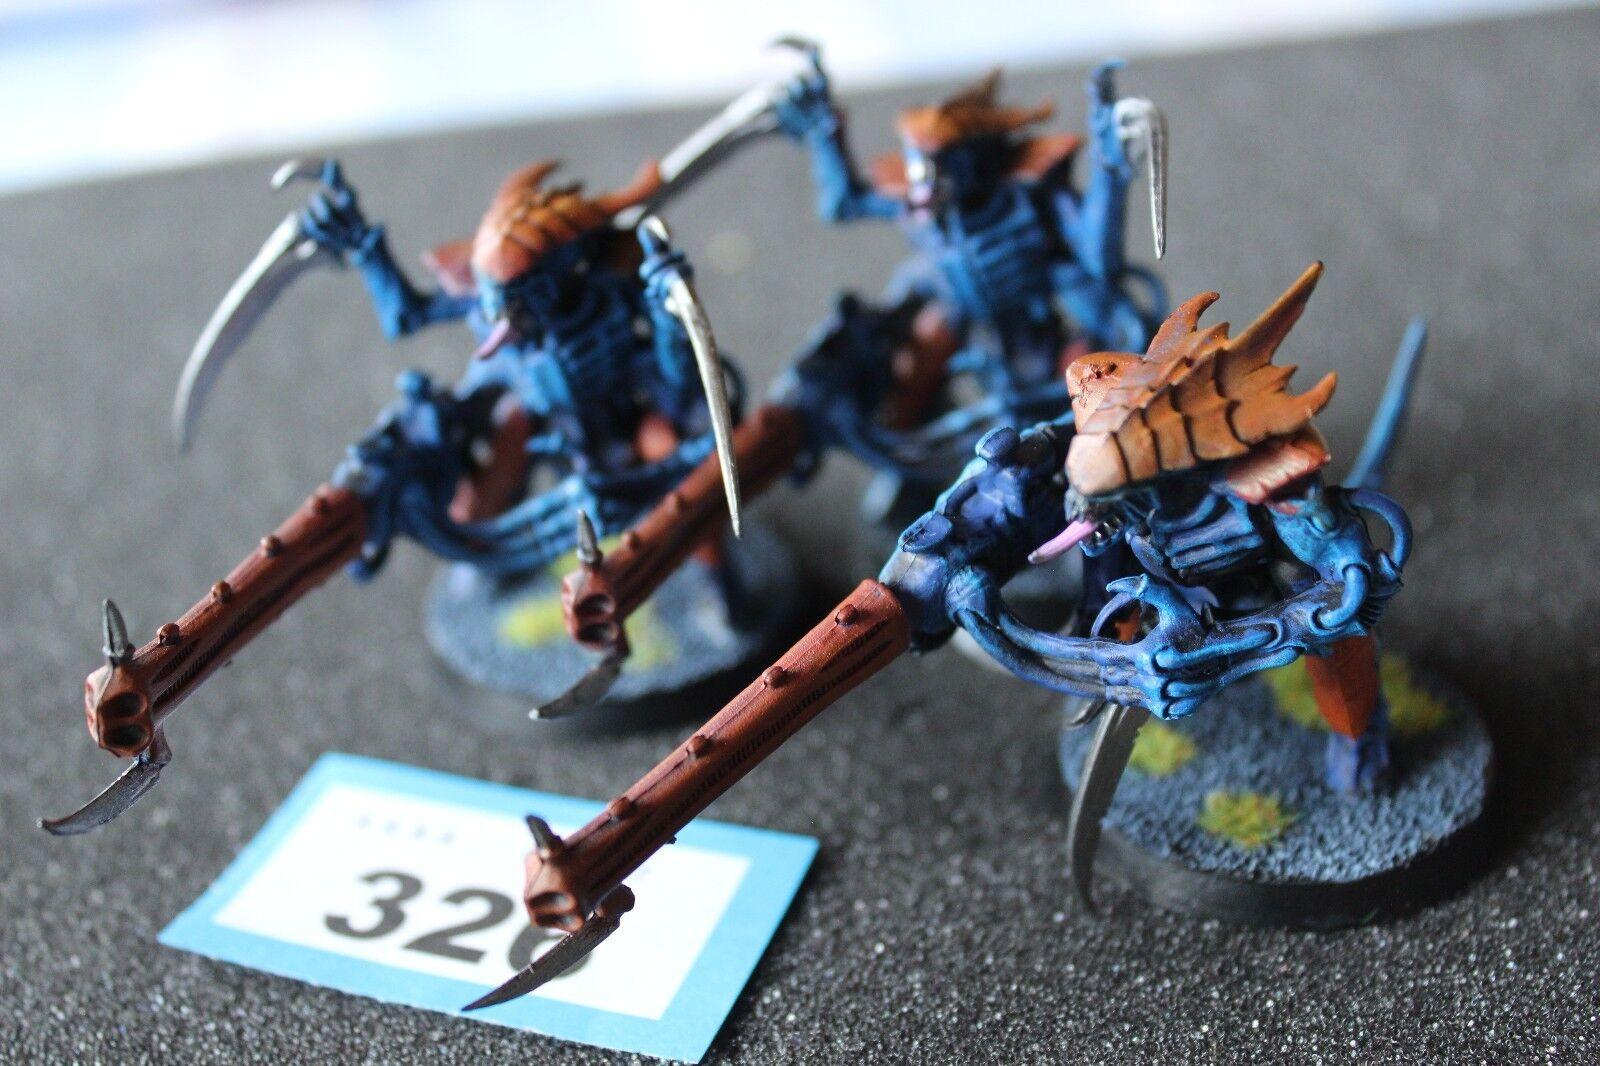 Games Workshop Warhammer 40k Tyranid Warriors x3 Venom Cannons Well Painted GW